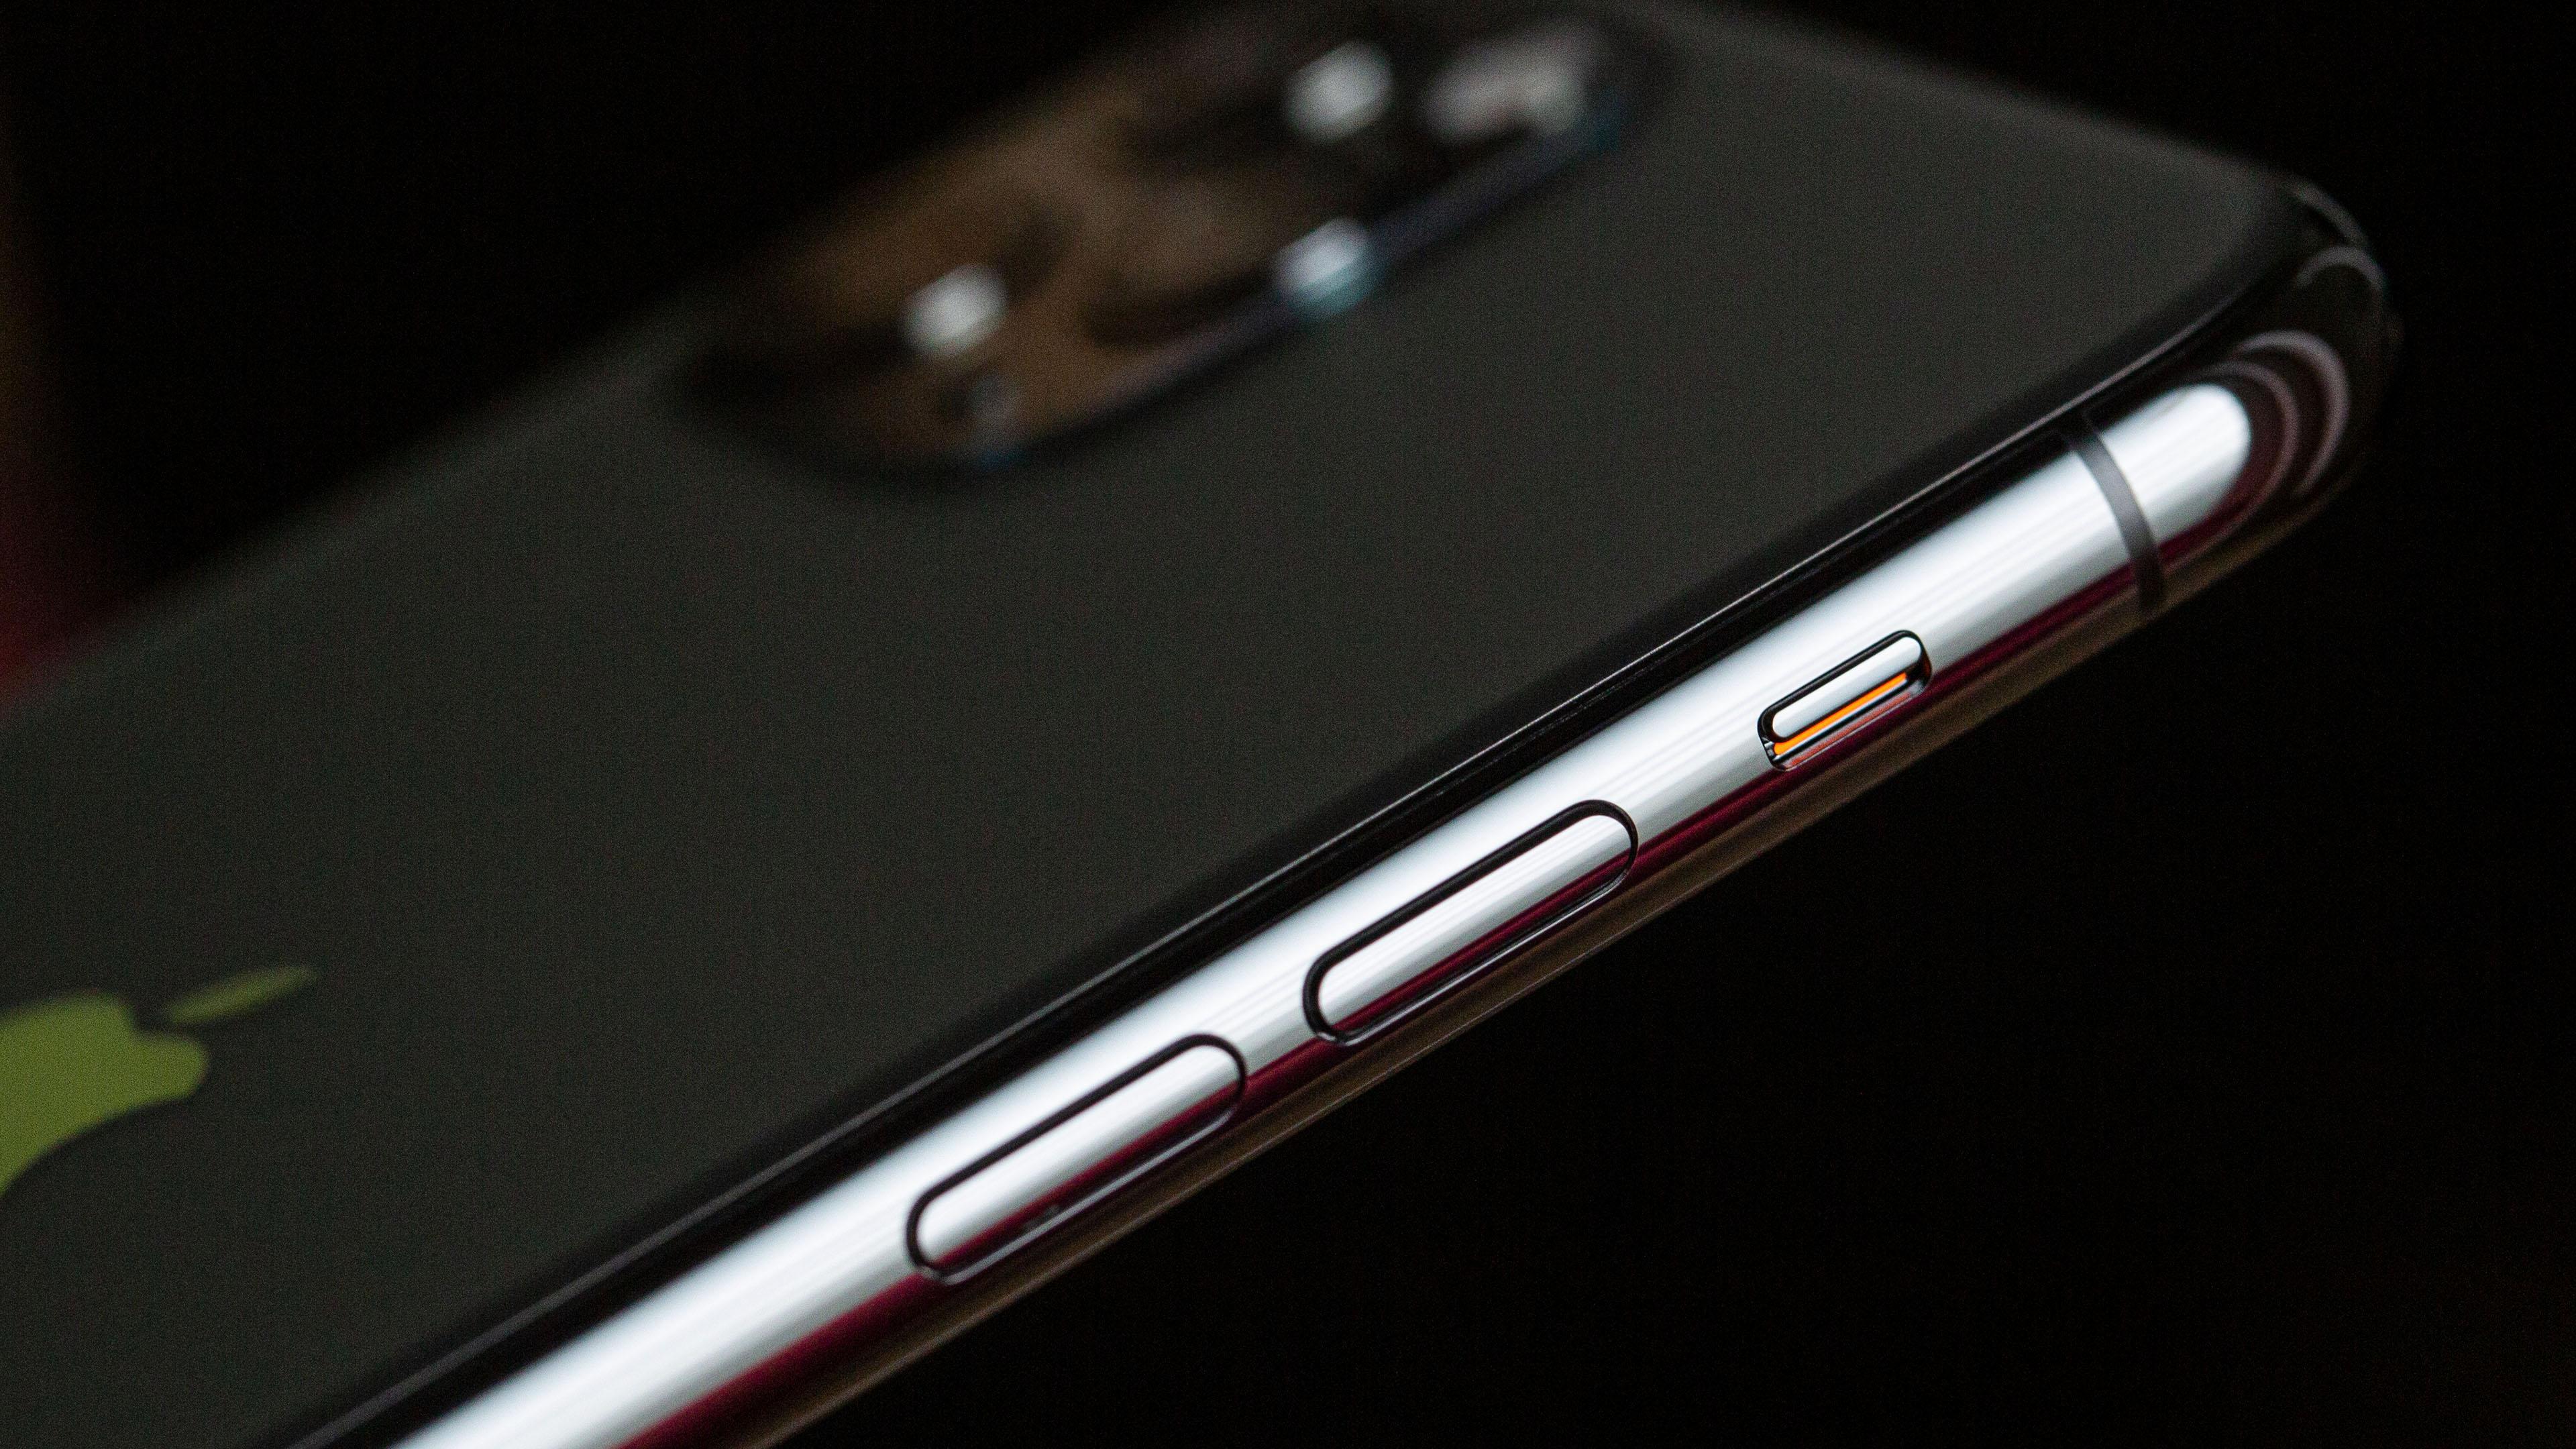 MicroLED: Apple investiert kräftig in neue Display-Technologie | AndroidPIT